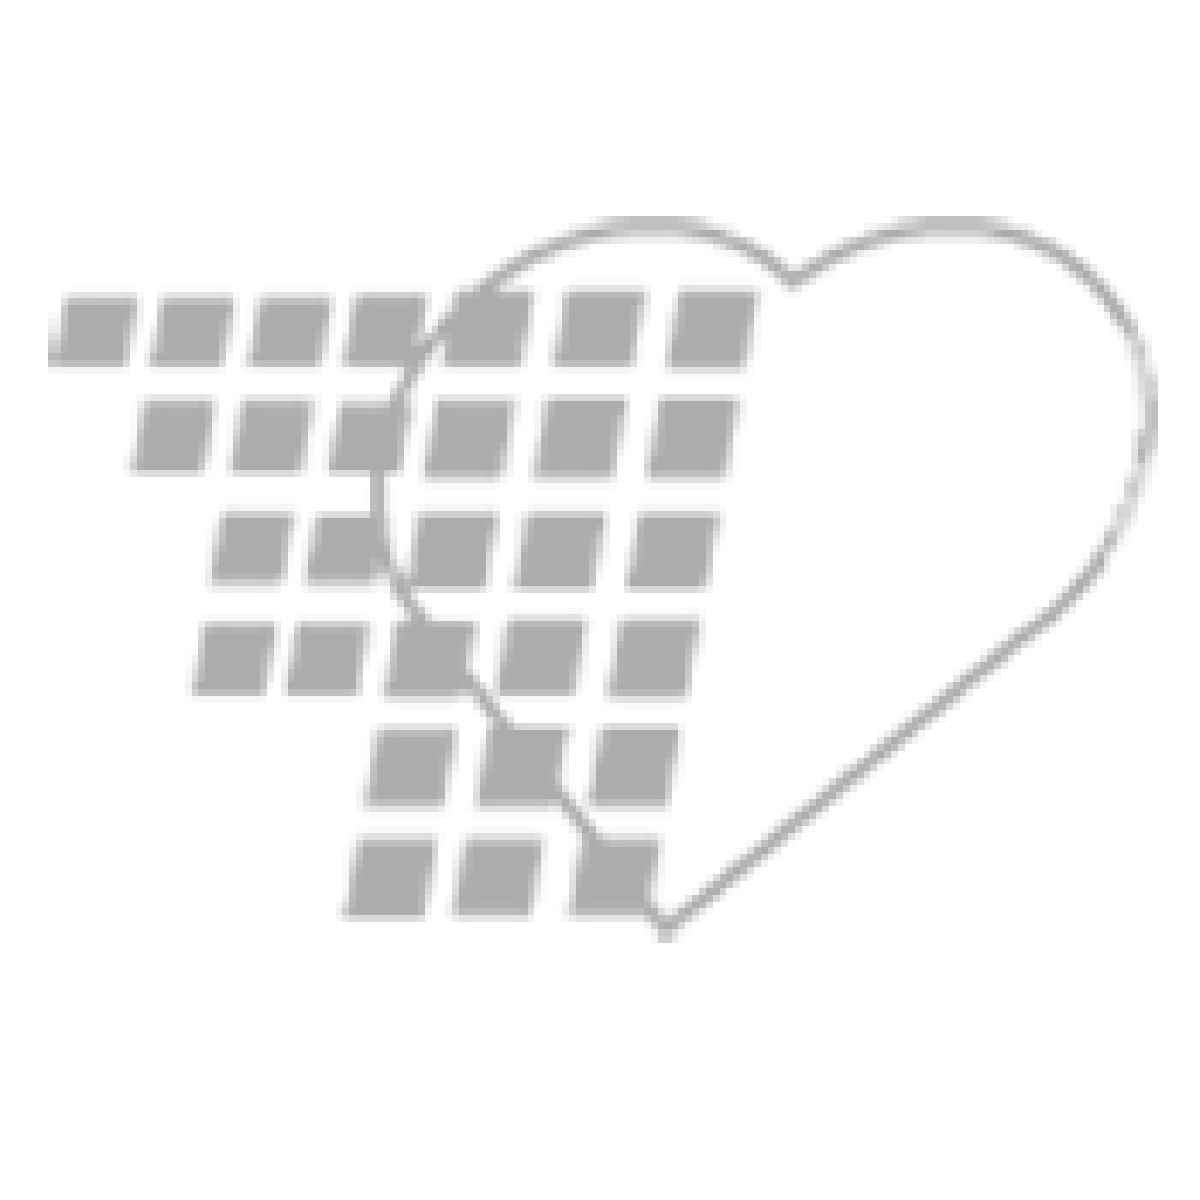 06-93-7505 Demo Dose® Amoxl and  Augmentn Pediatric Reconstitution Kit